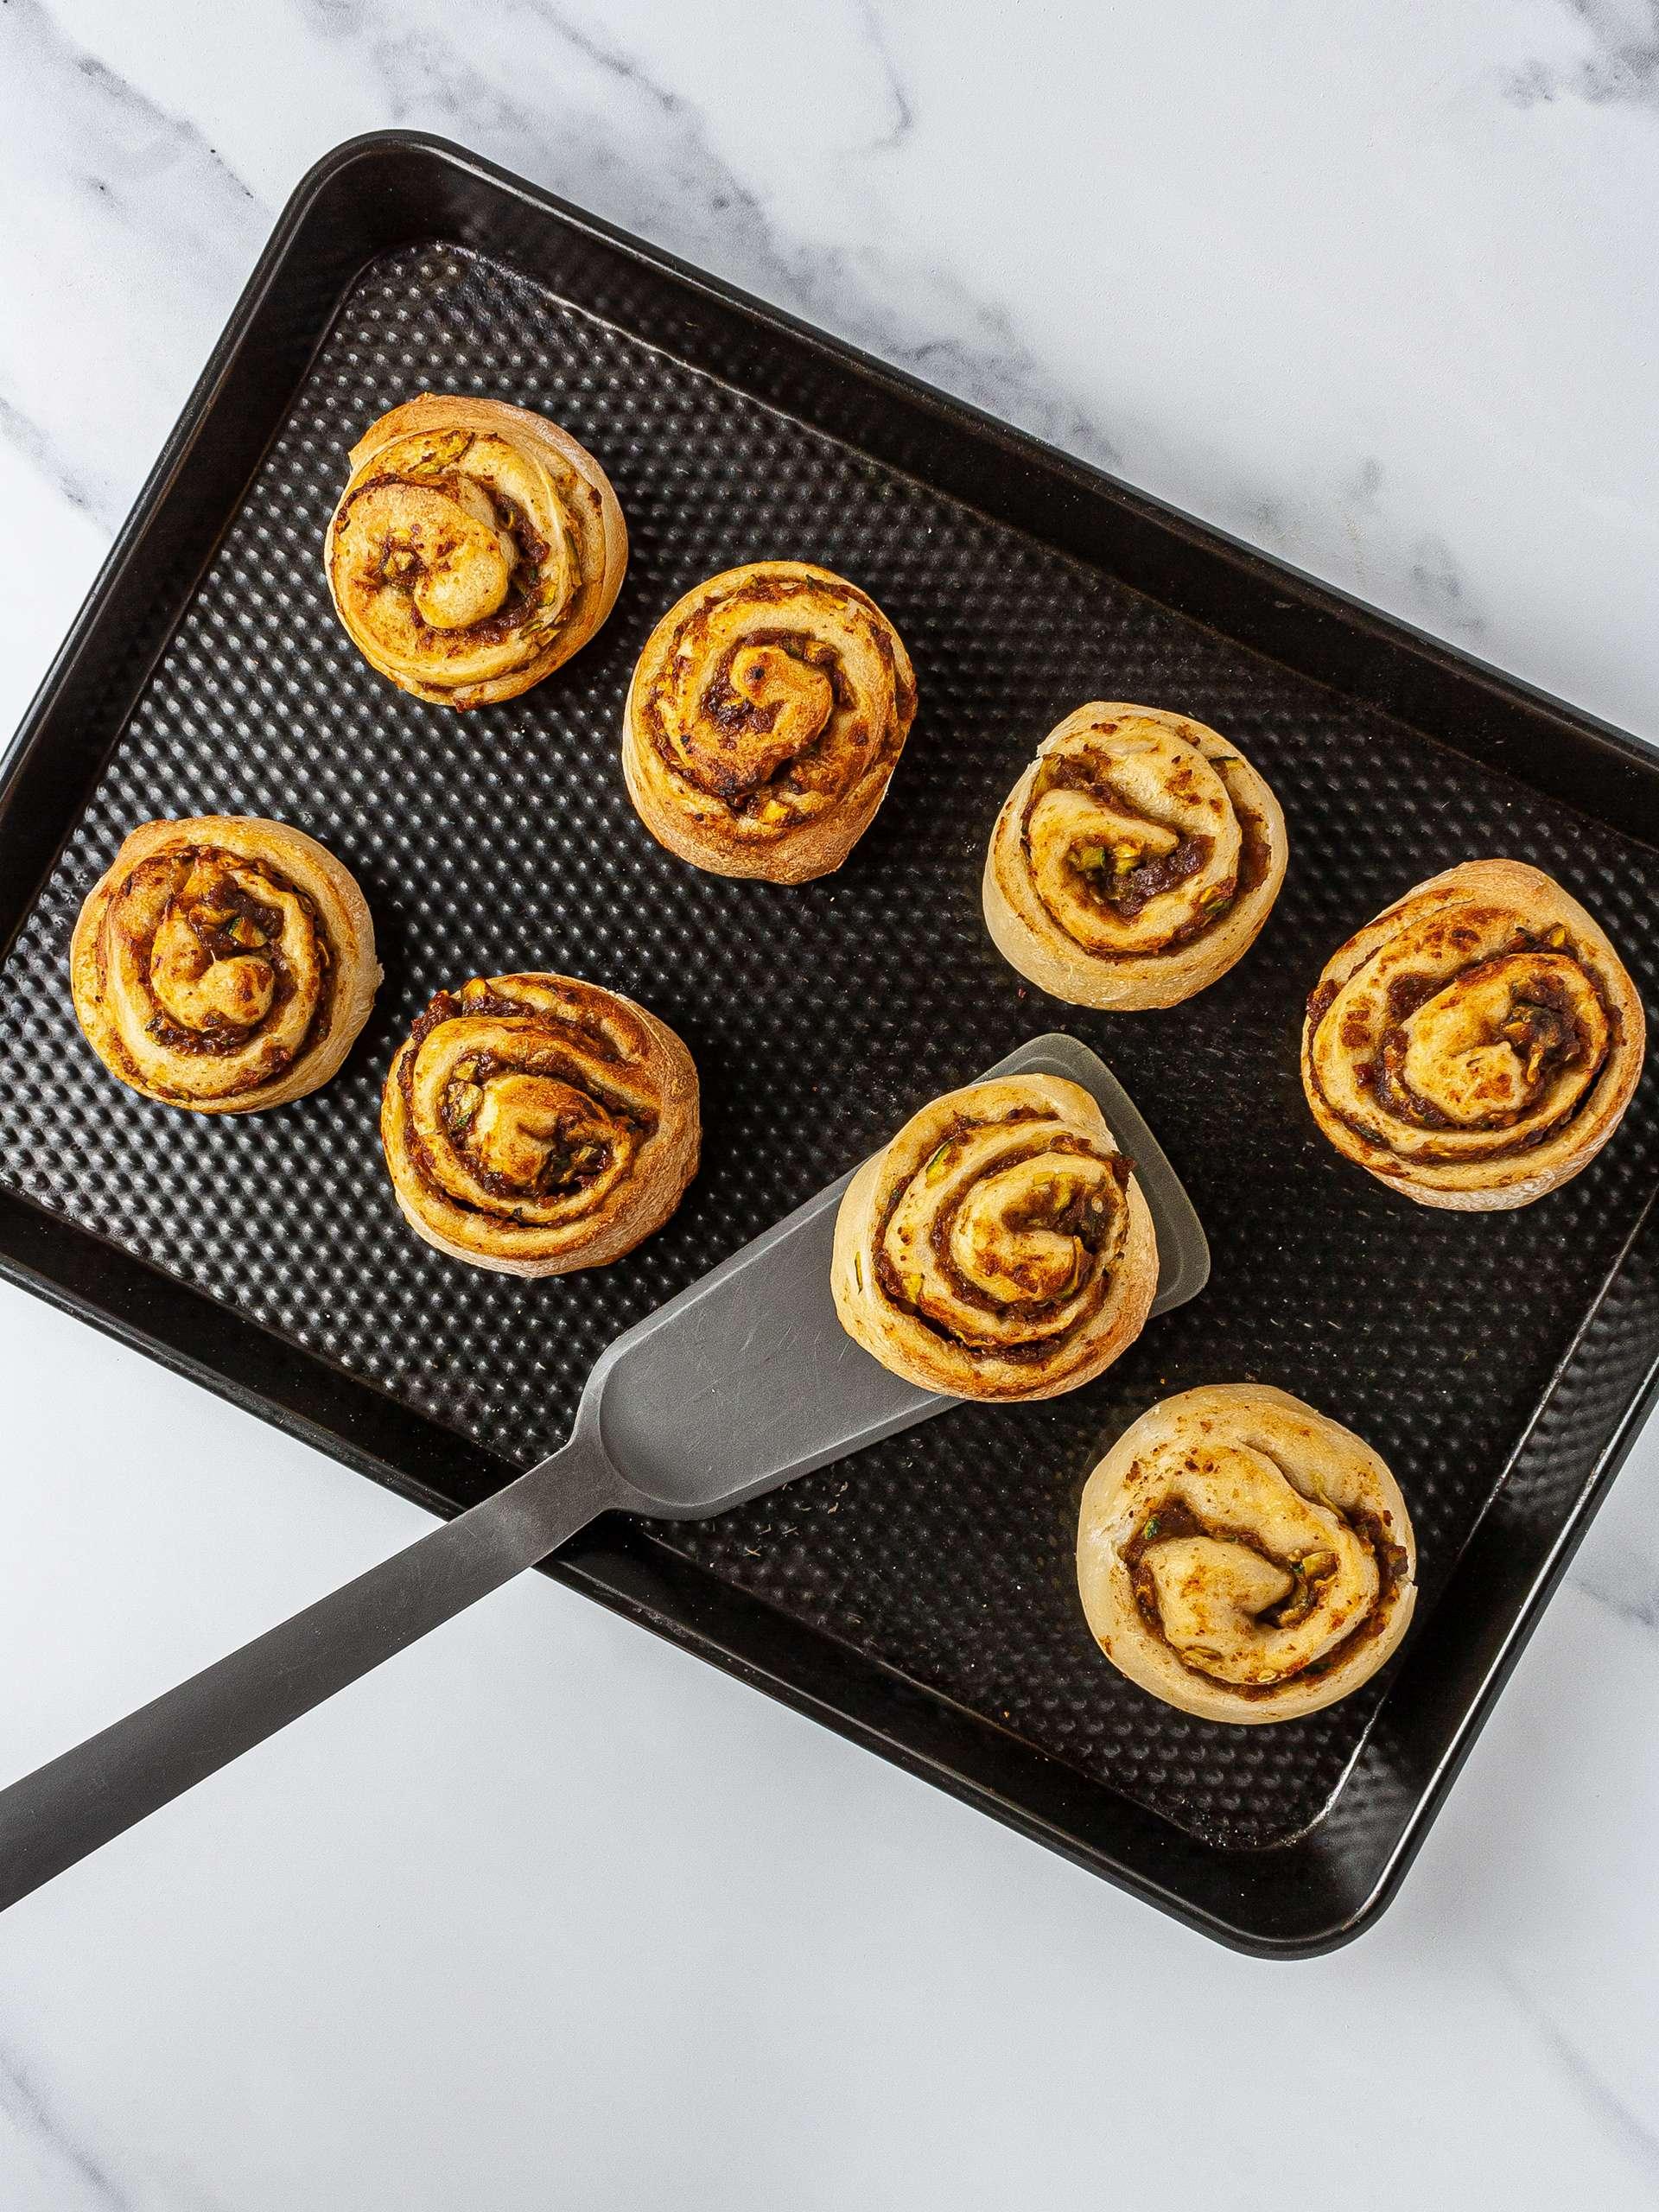 Baked zucchini cinnamon buns on tray.